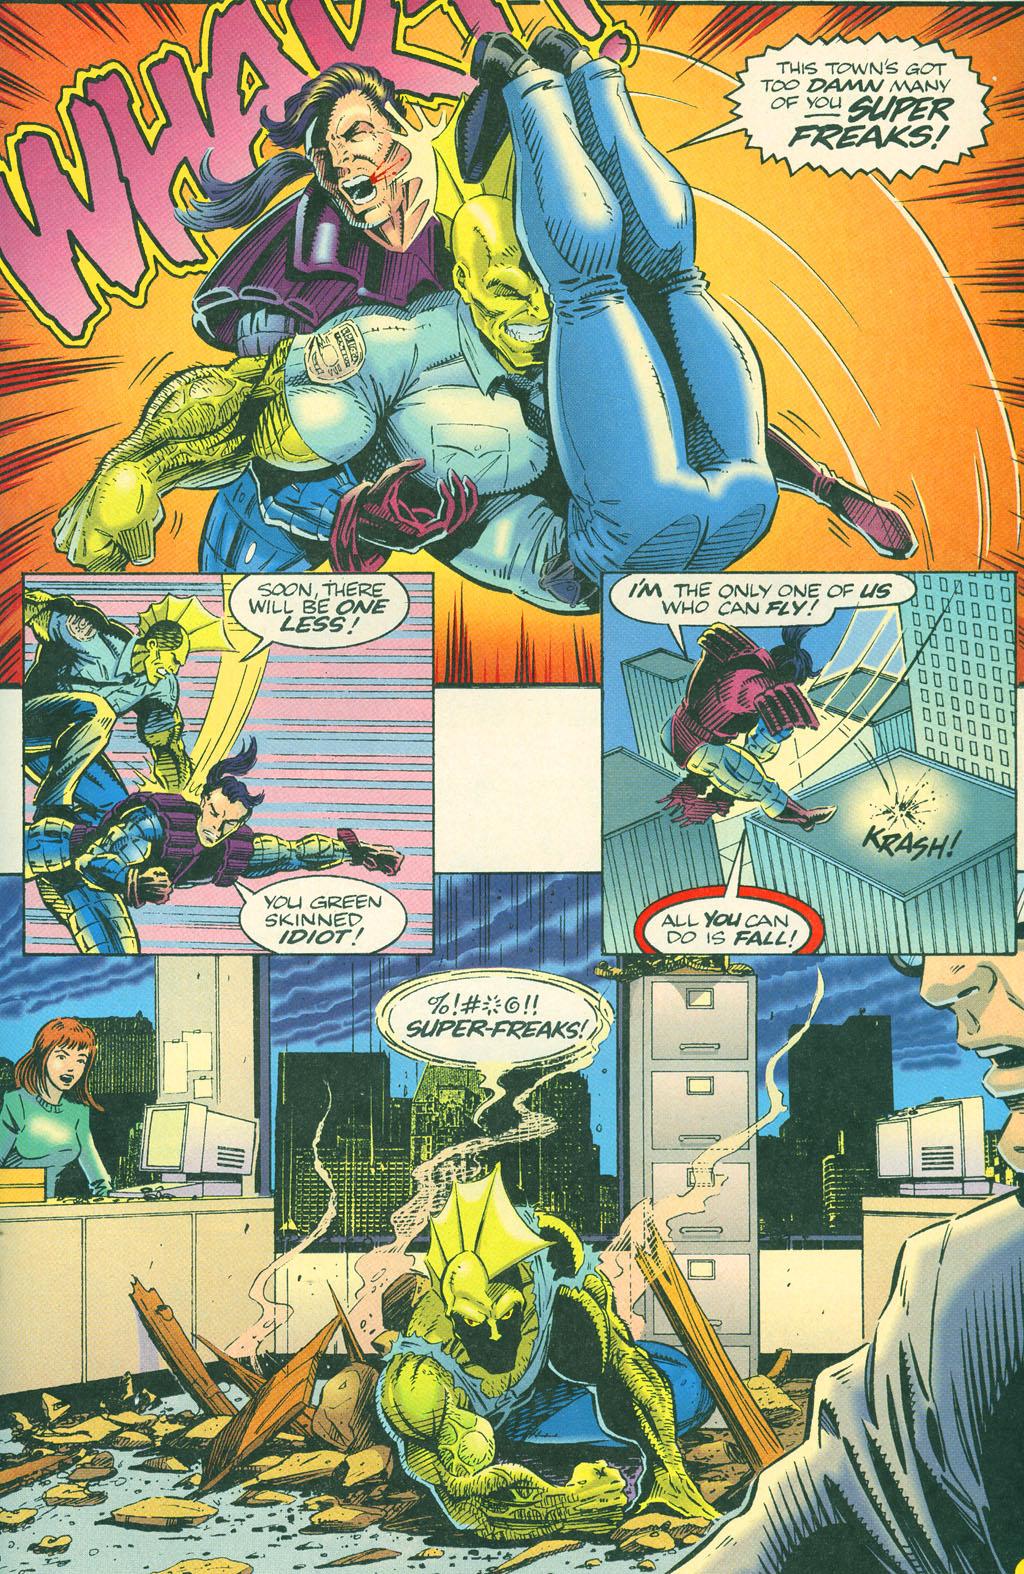 Read online ShadowHawk comic -  Issue #4 - 23